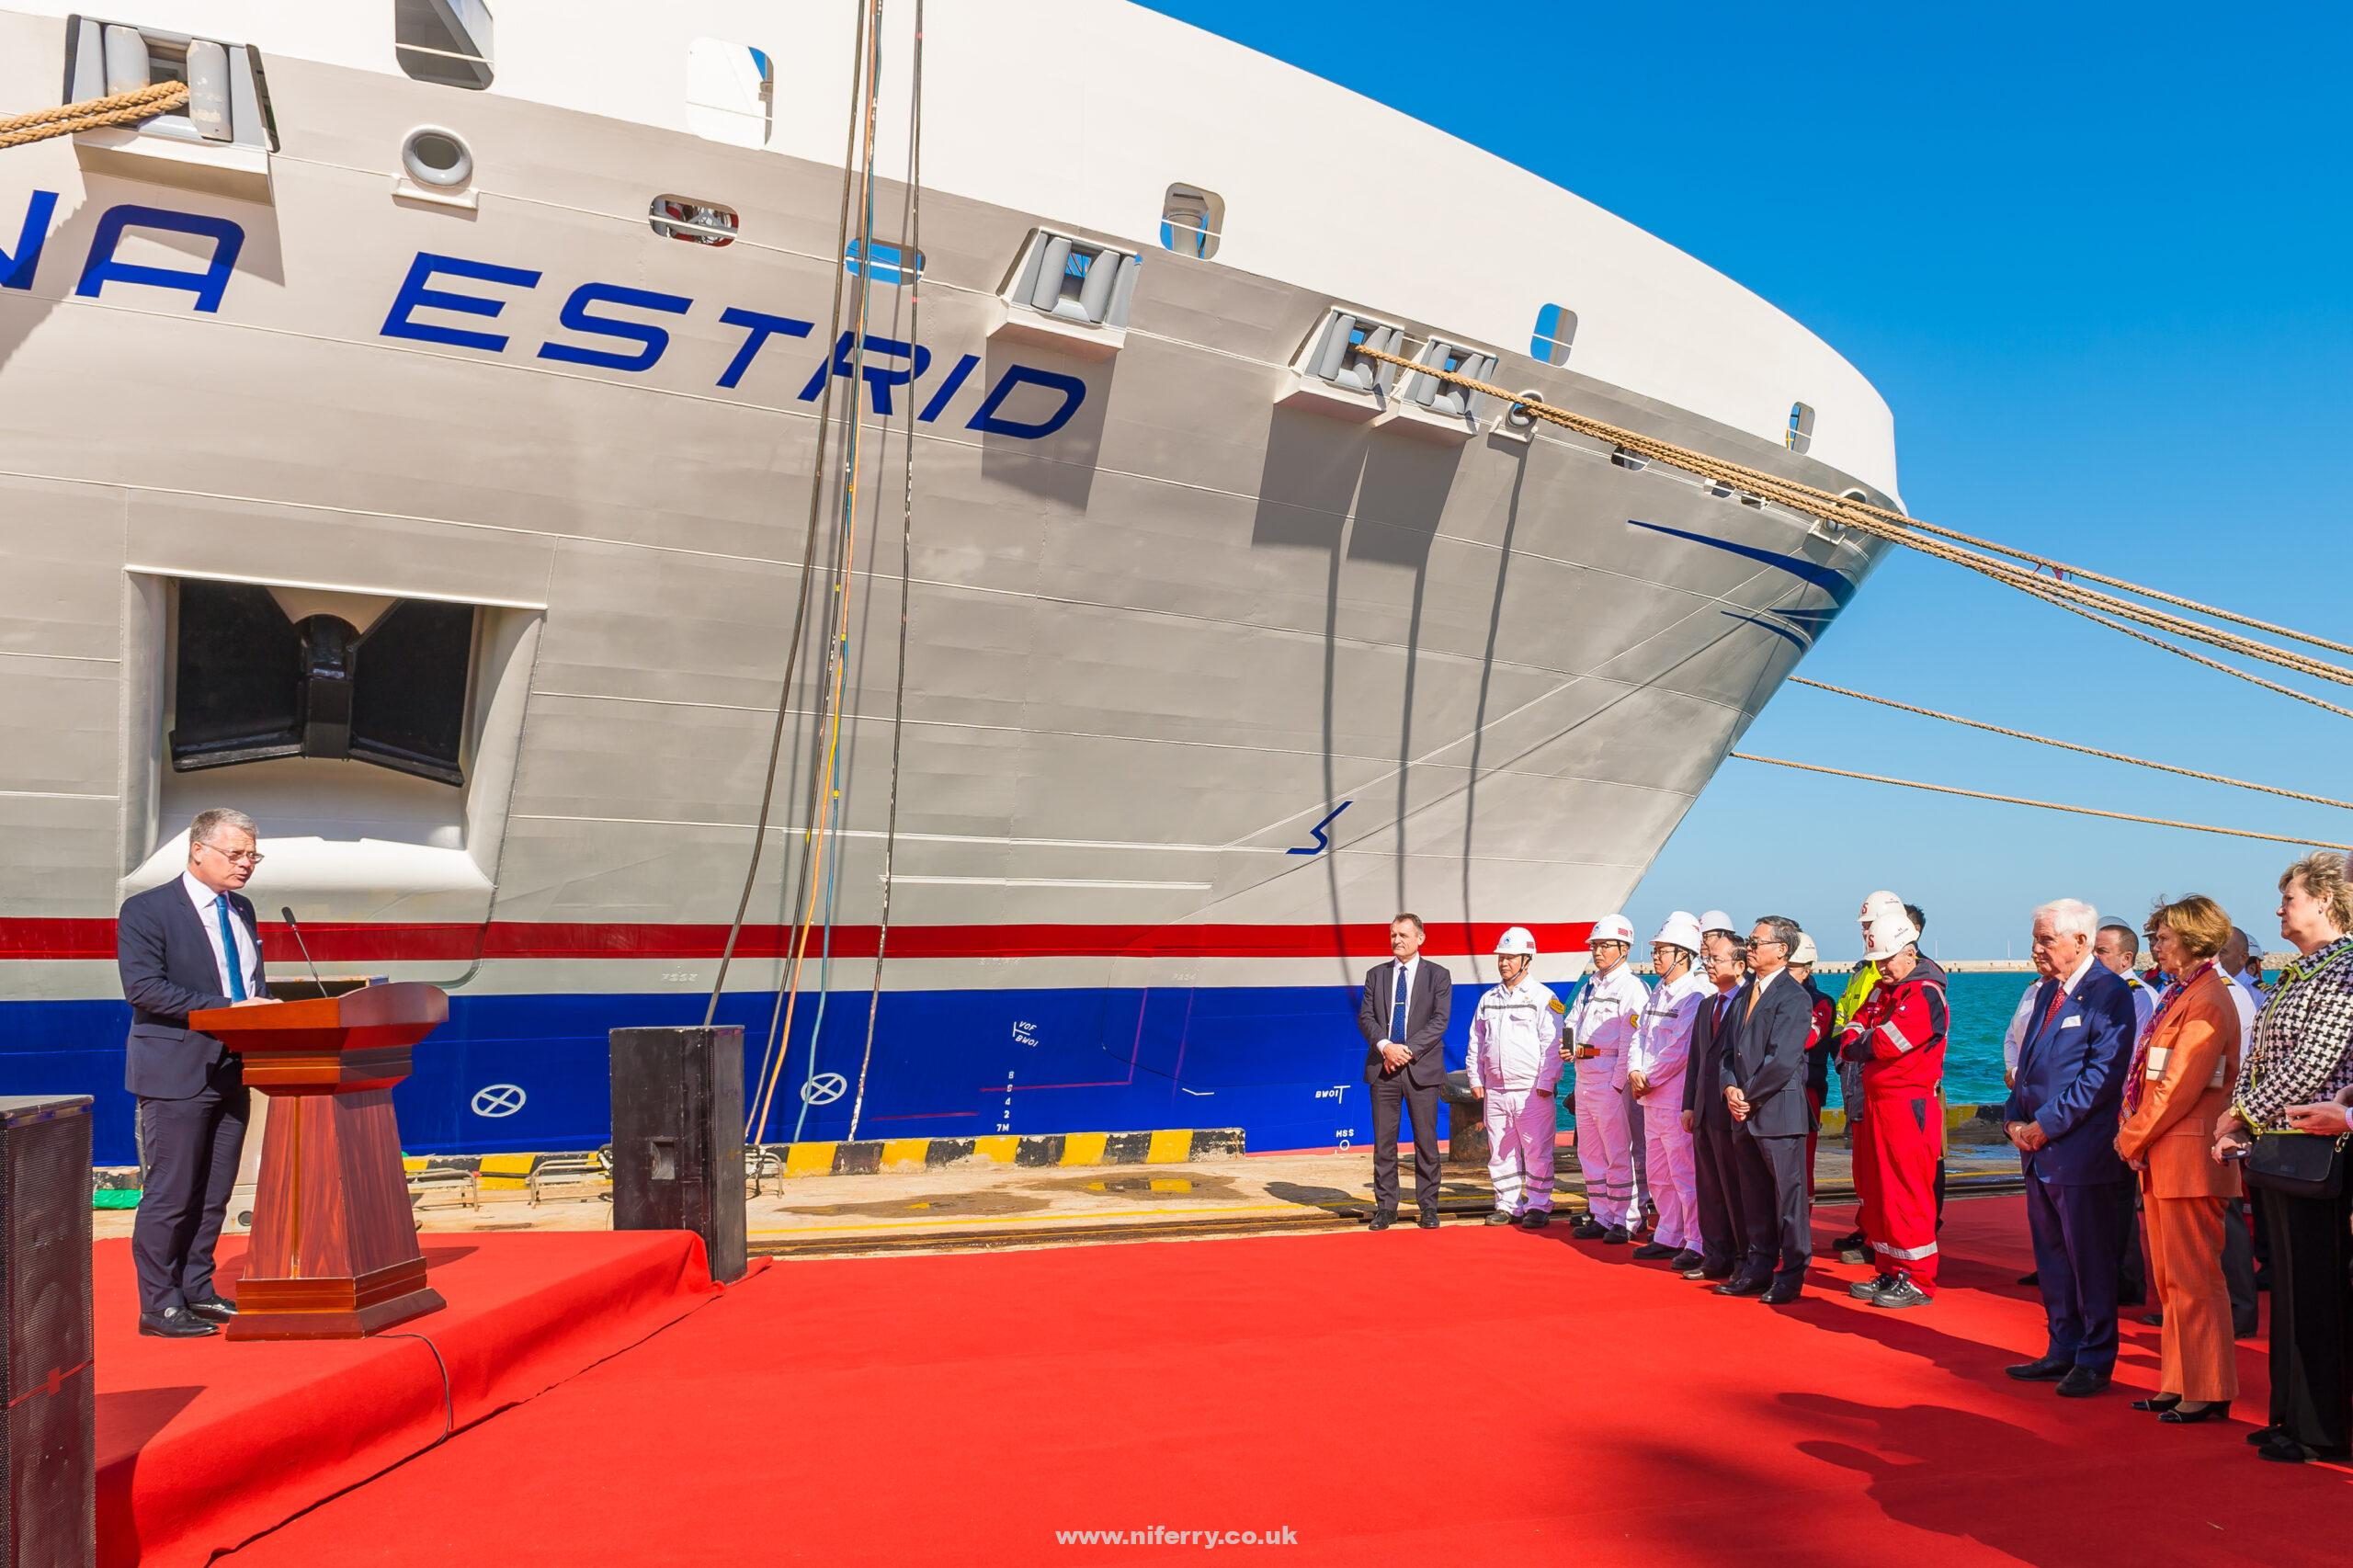 Niclas Mårtensson, CEO Stena Line in front of Stena Estrid